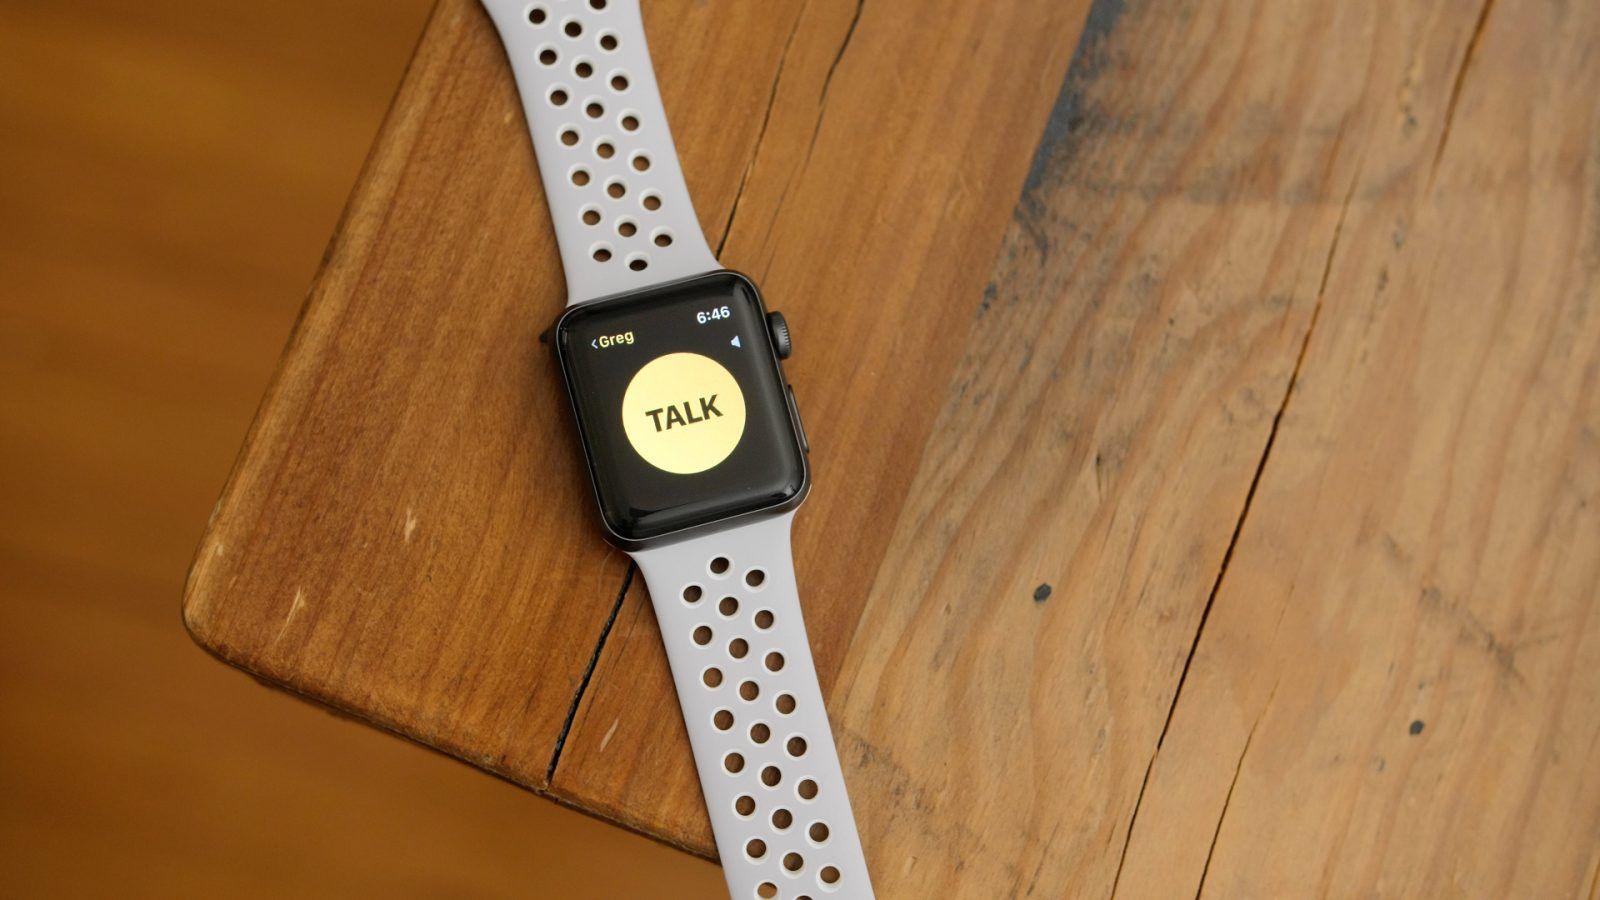 Handson WalkieTalkie on Apple Watch with watchOS 5 beta